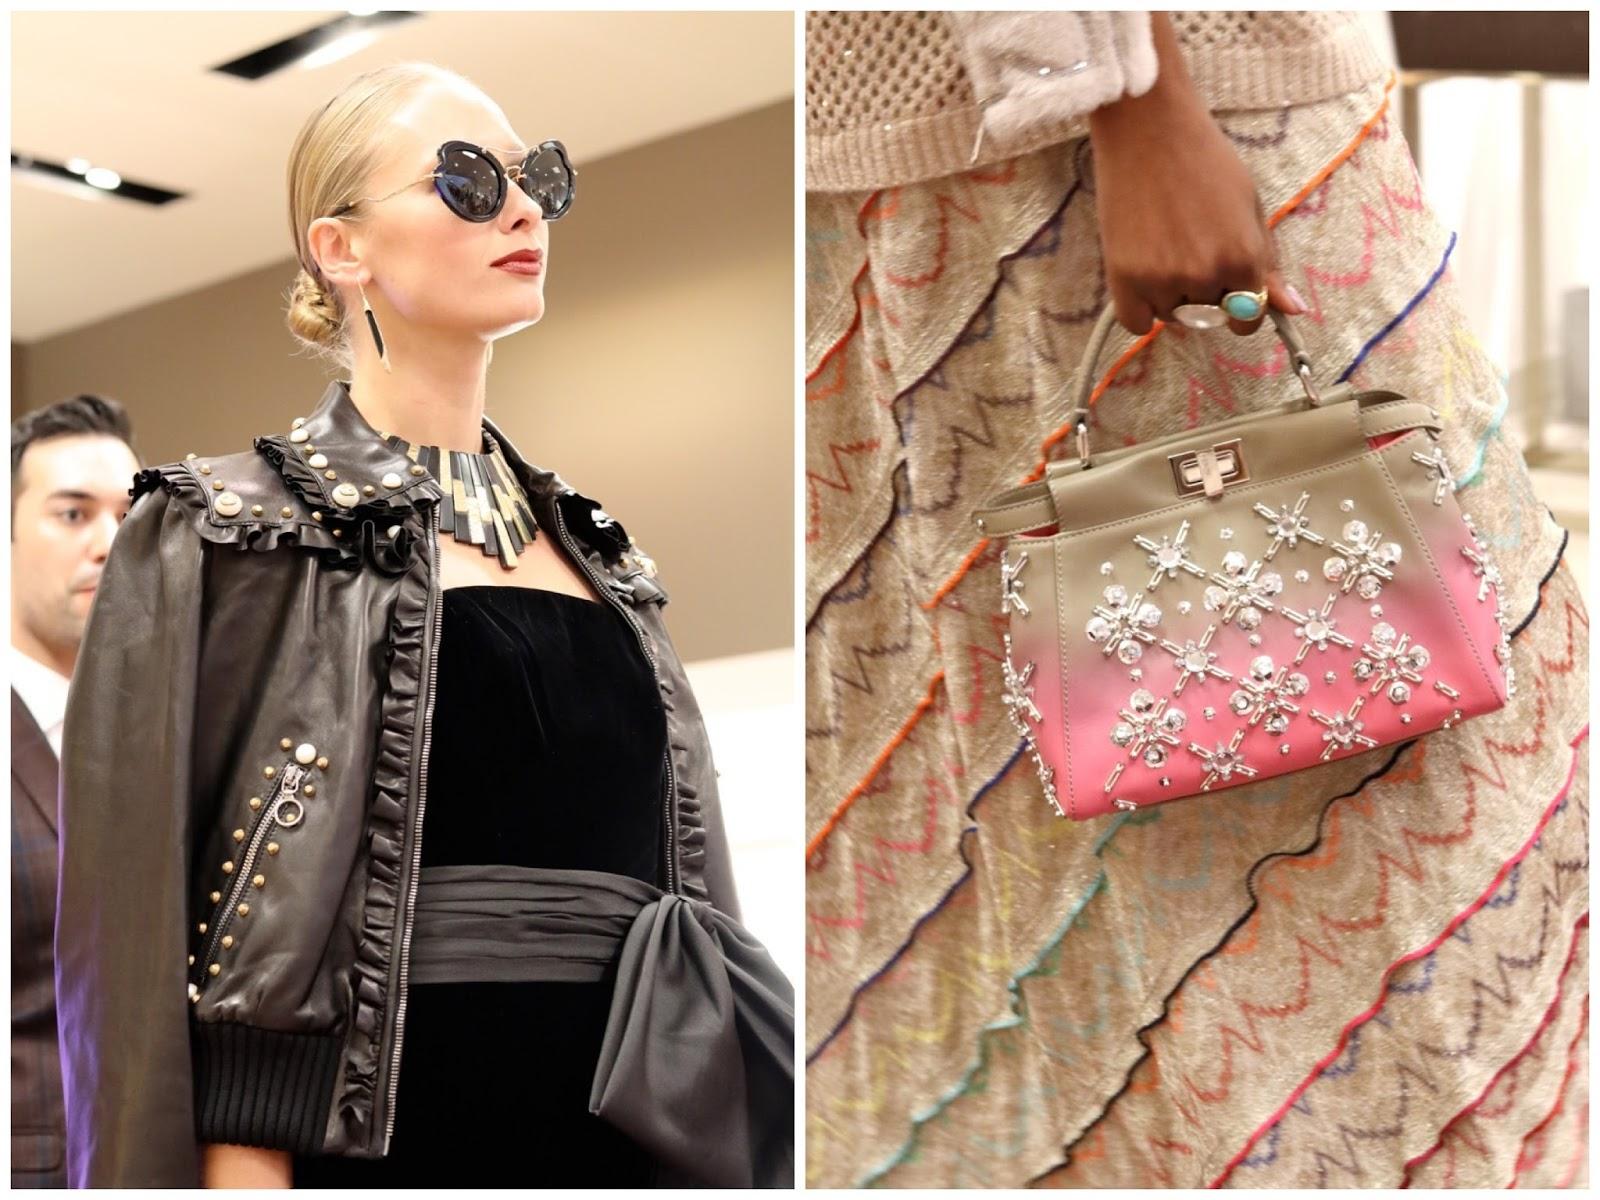 statement sunglasses, gucci leather jeacket, black on black for fall, top handle luxury handbag